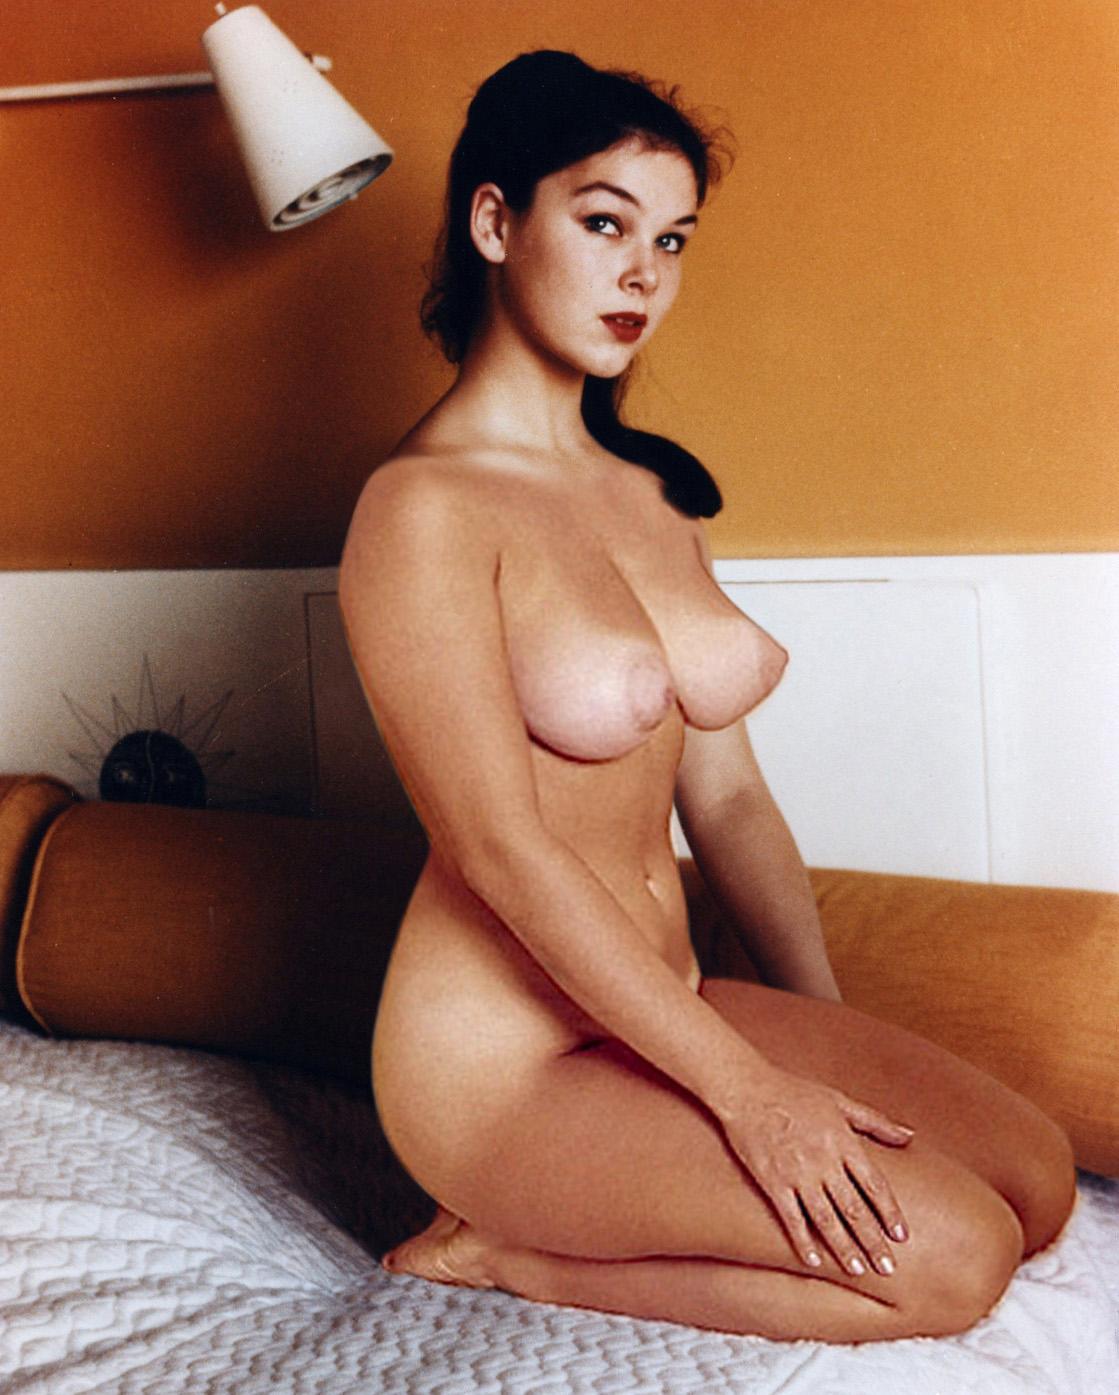 Yvonne craig free porn photos, youn young girls posing